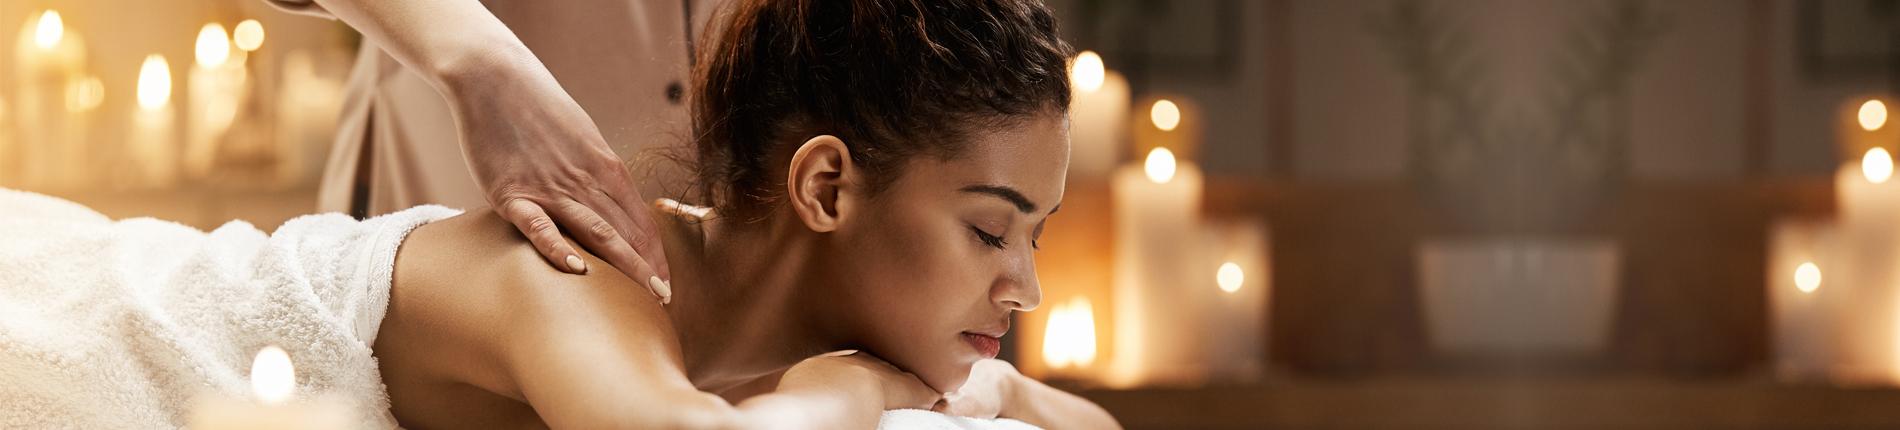 Massage Therapy Faqs Dorsey Schools Mi Massage